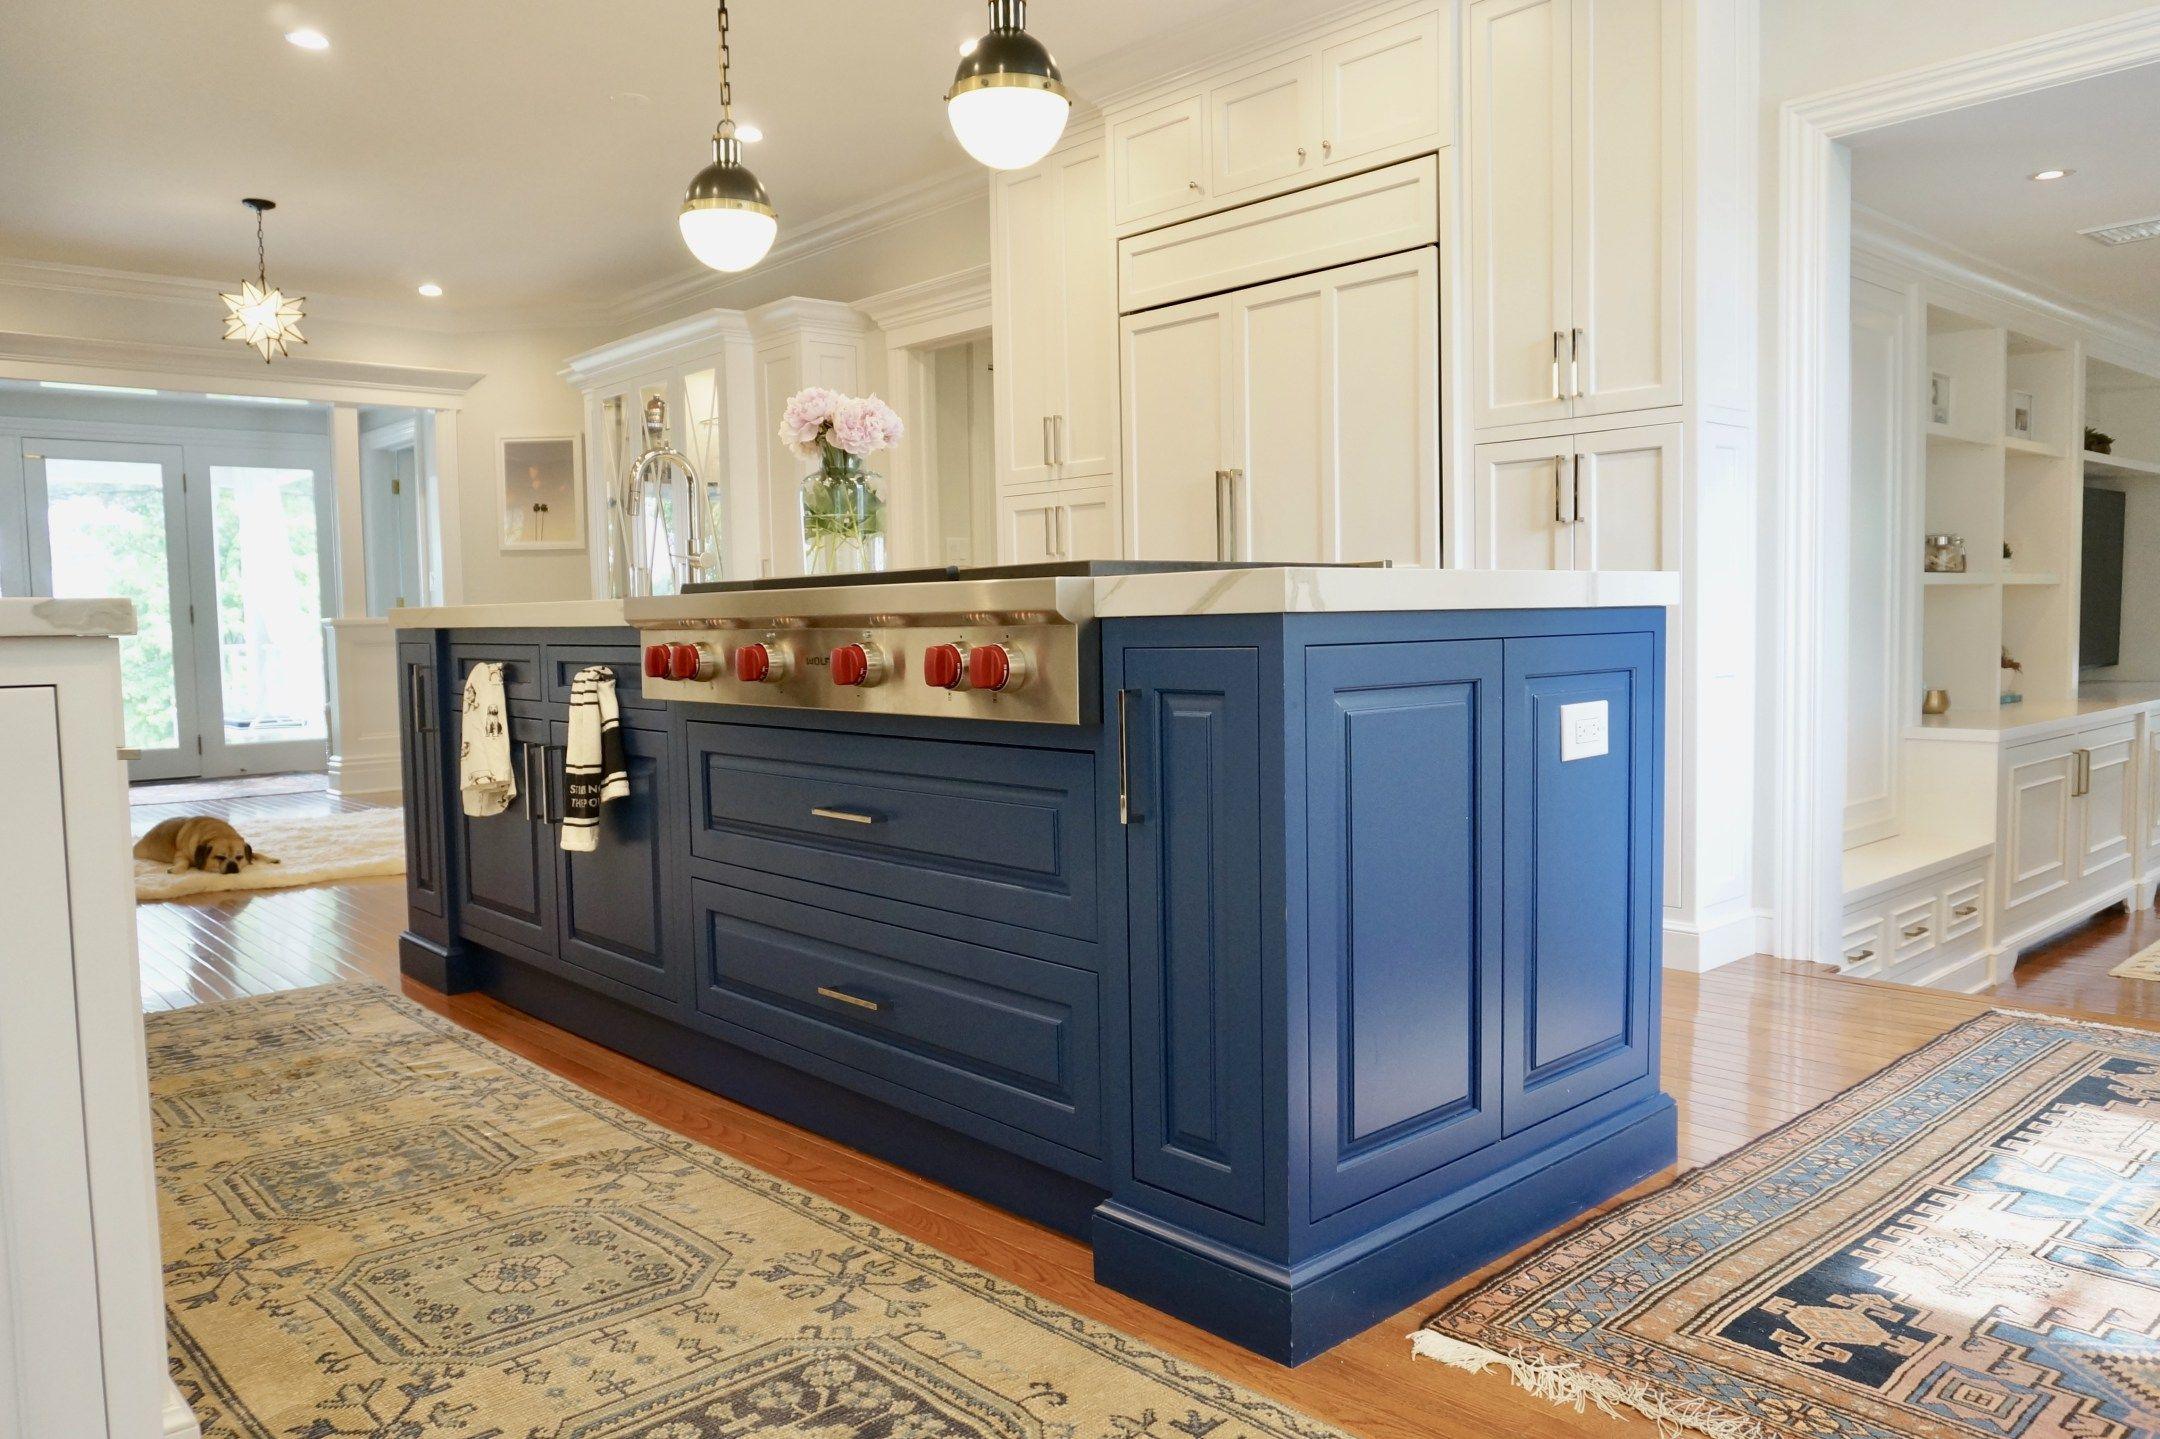 Kitchen Renovation Reveal | Blue kitchen cabinets, Painted kitchen cabinets colors, Blue kitchens